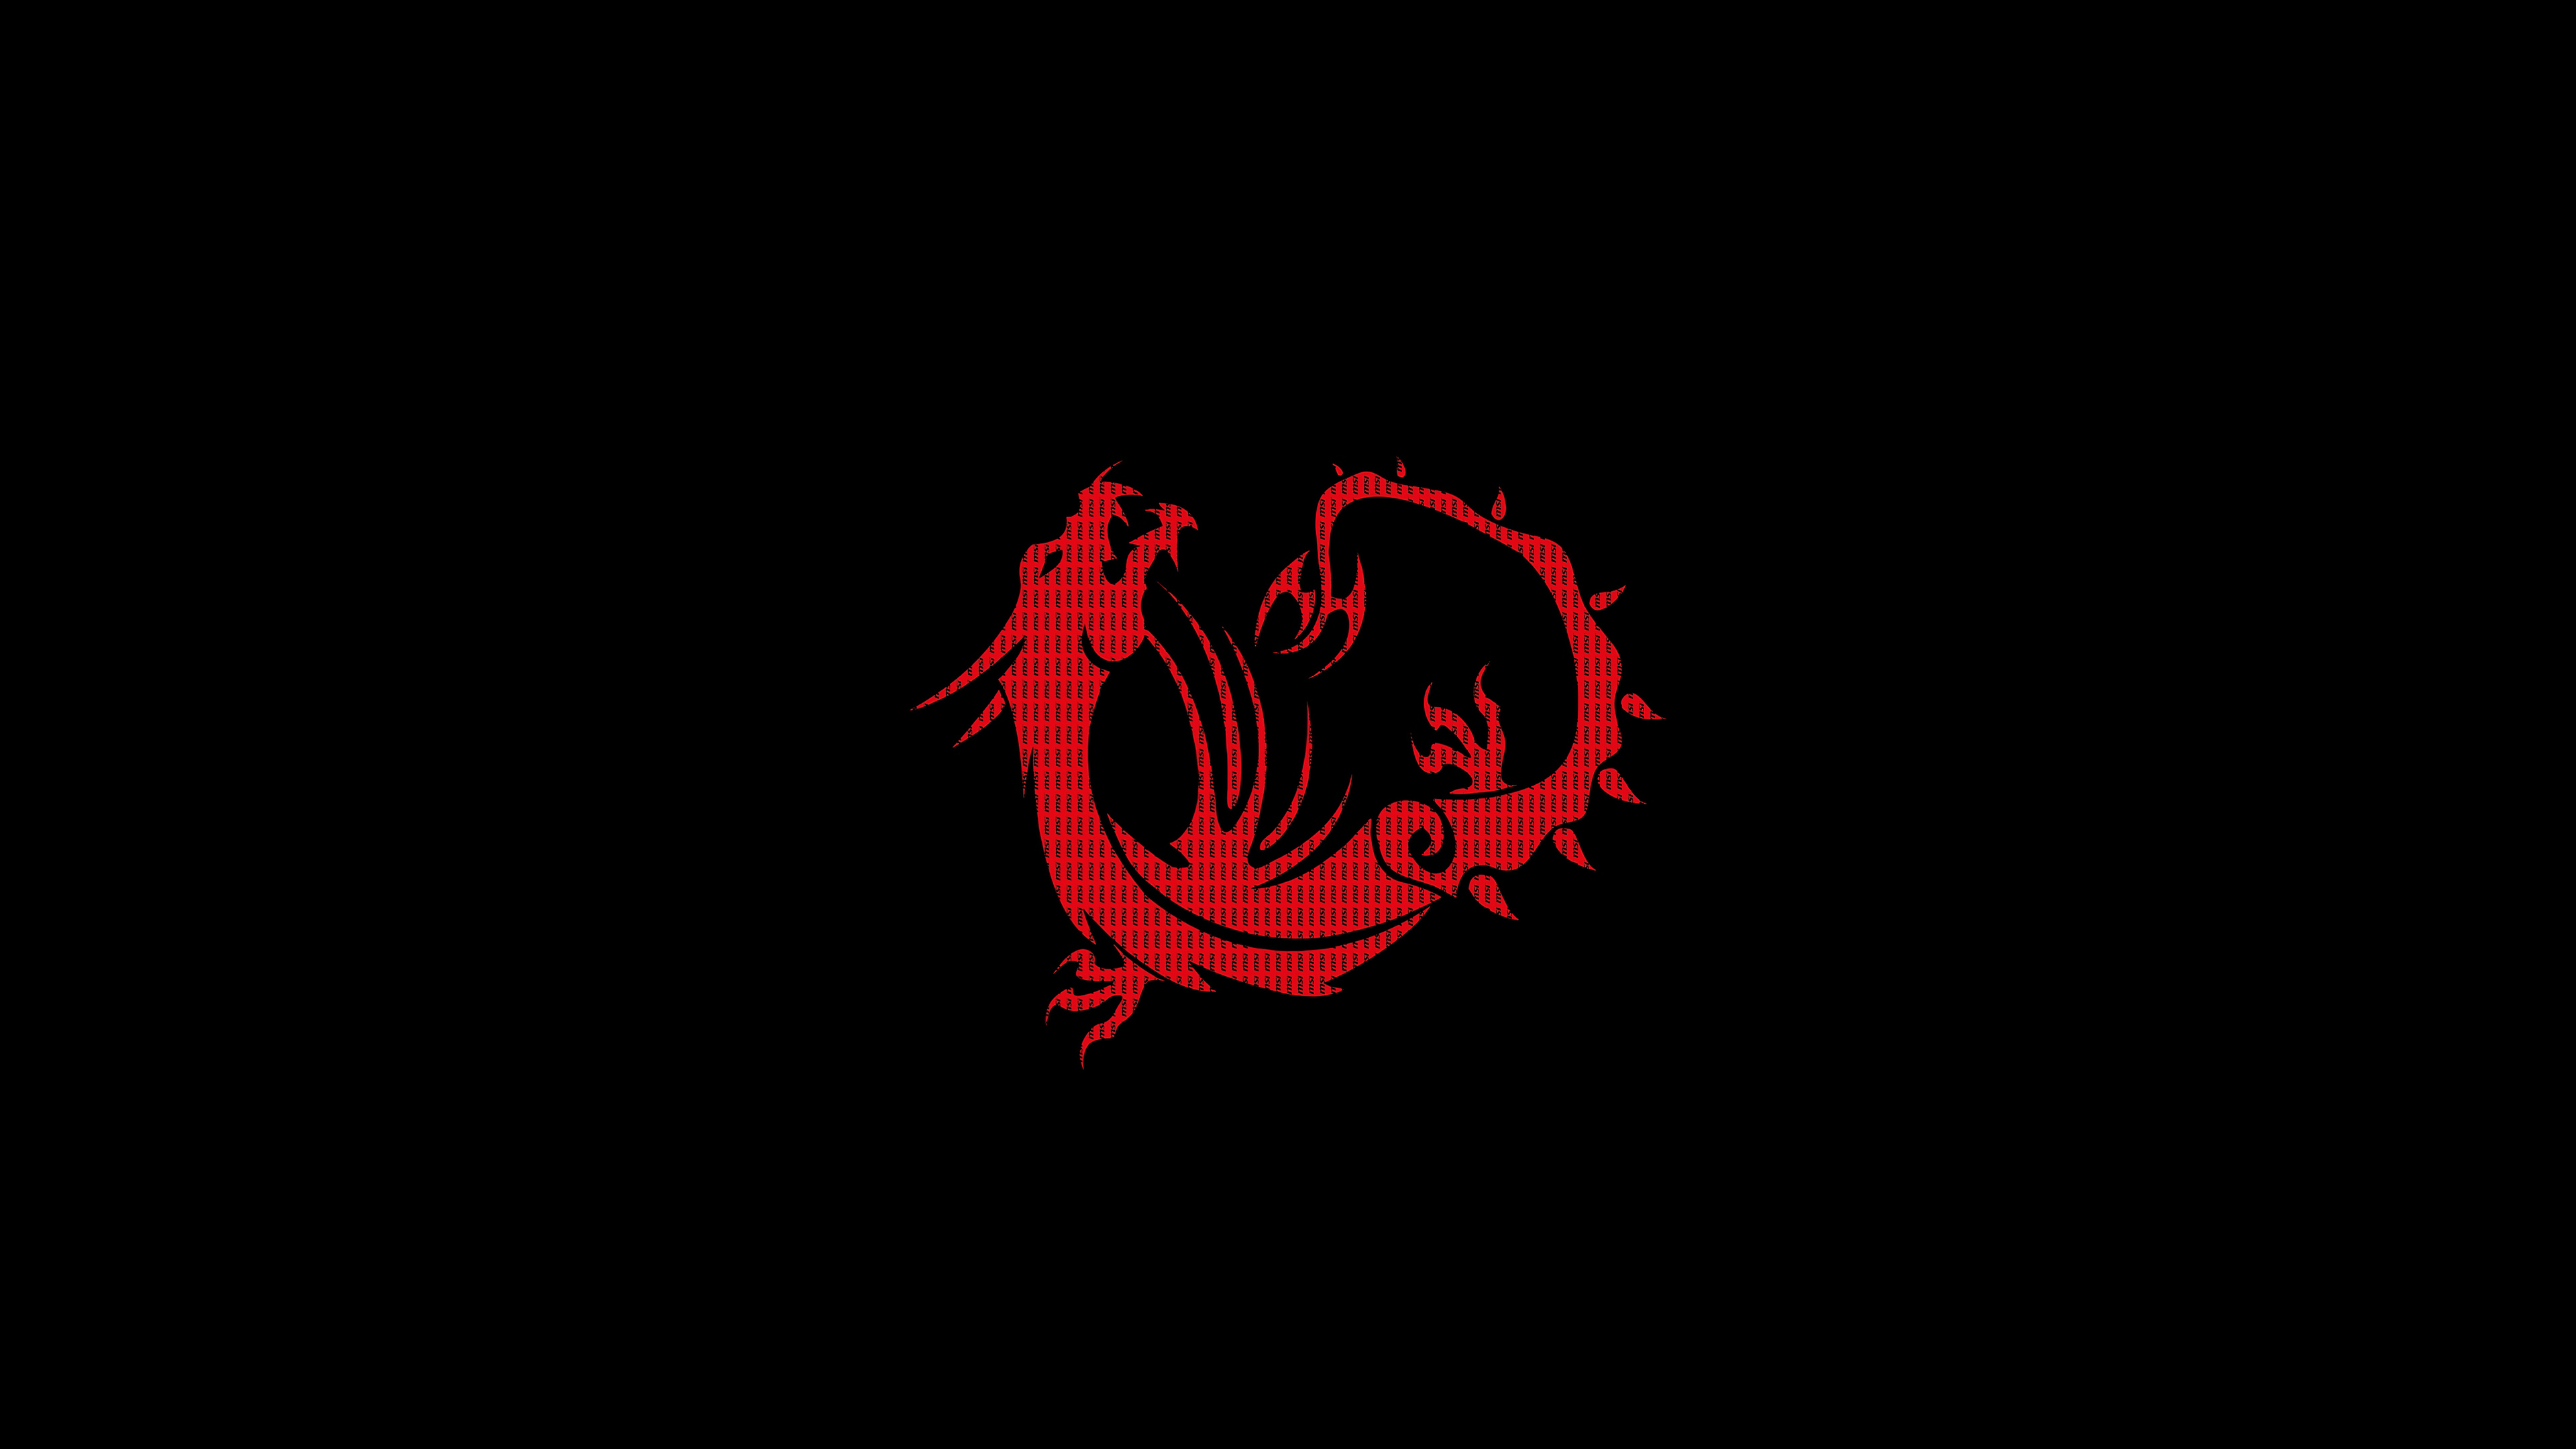 red dragon black minimal 1578255451 - Red Dragon Black Minimal -